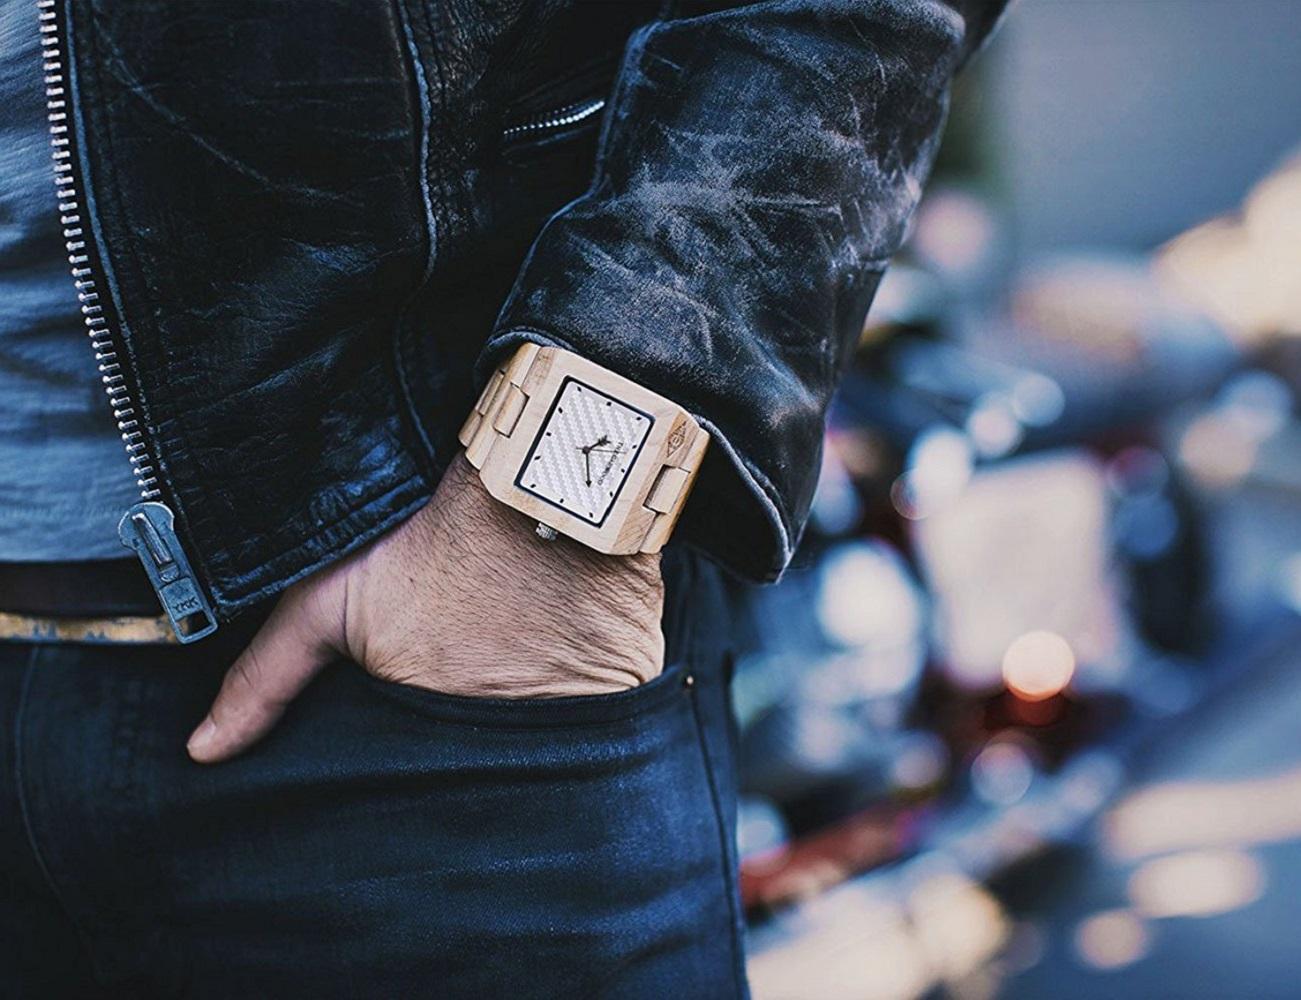 35 Black Watch by The Garwood